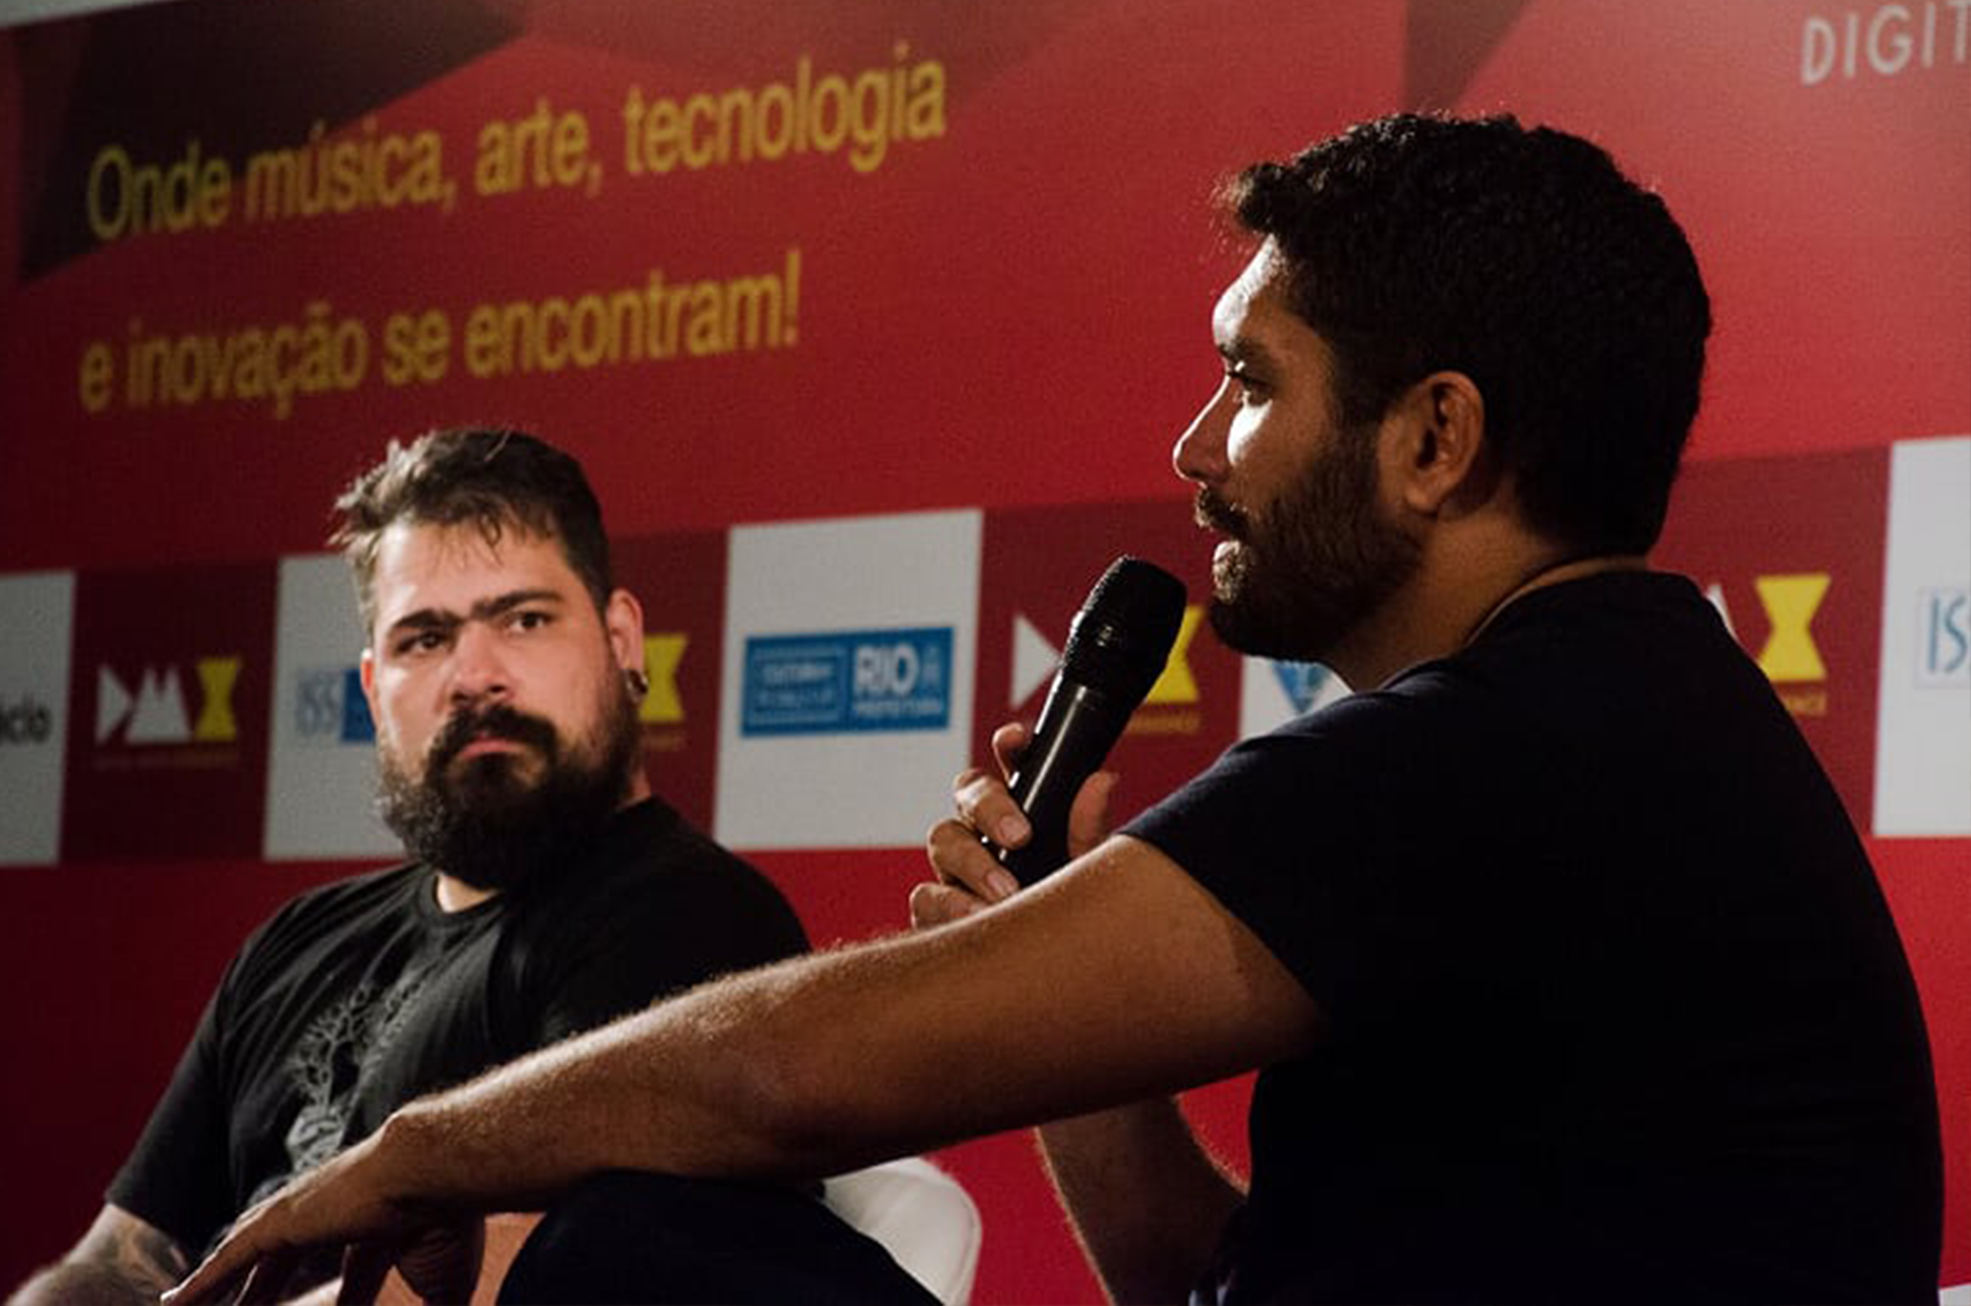 Jacques Barcia e Giordano Cabral (Foto: Lucas Lussac)